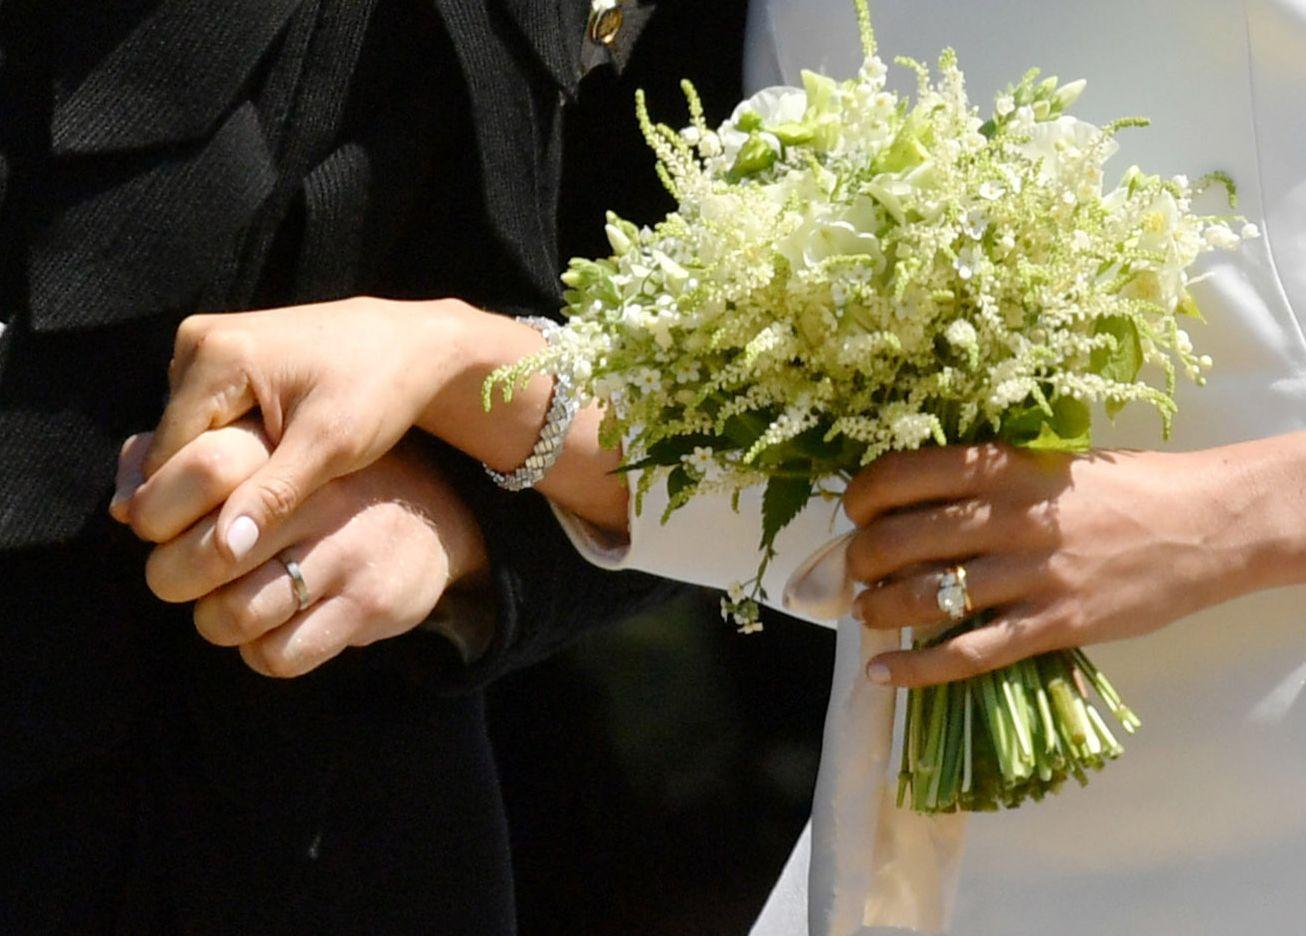 Prince Harry And Meghan Markle Wear Wedding Bands Meghan Markle Royal Wedding Ring Photos